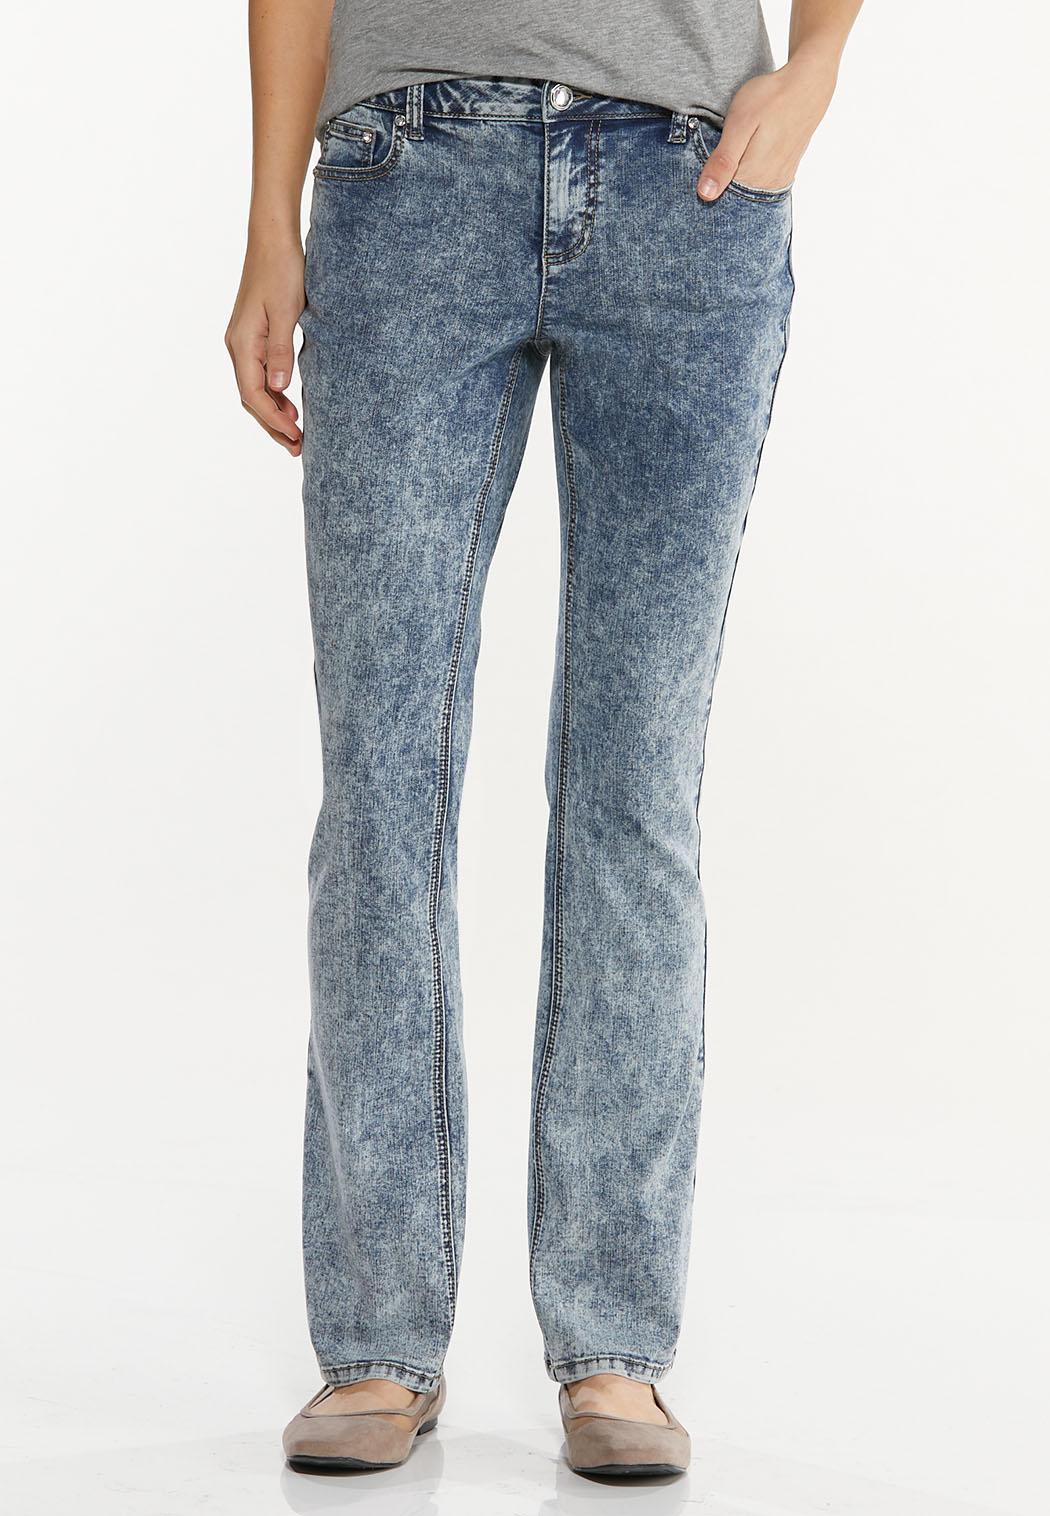 Dark Vintage Wash Jeans (Item #44510702)